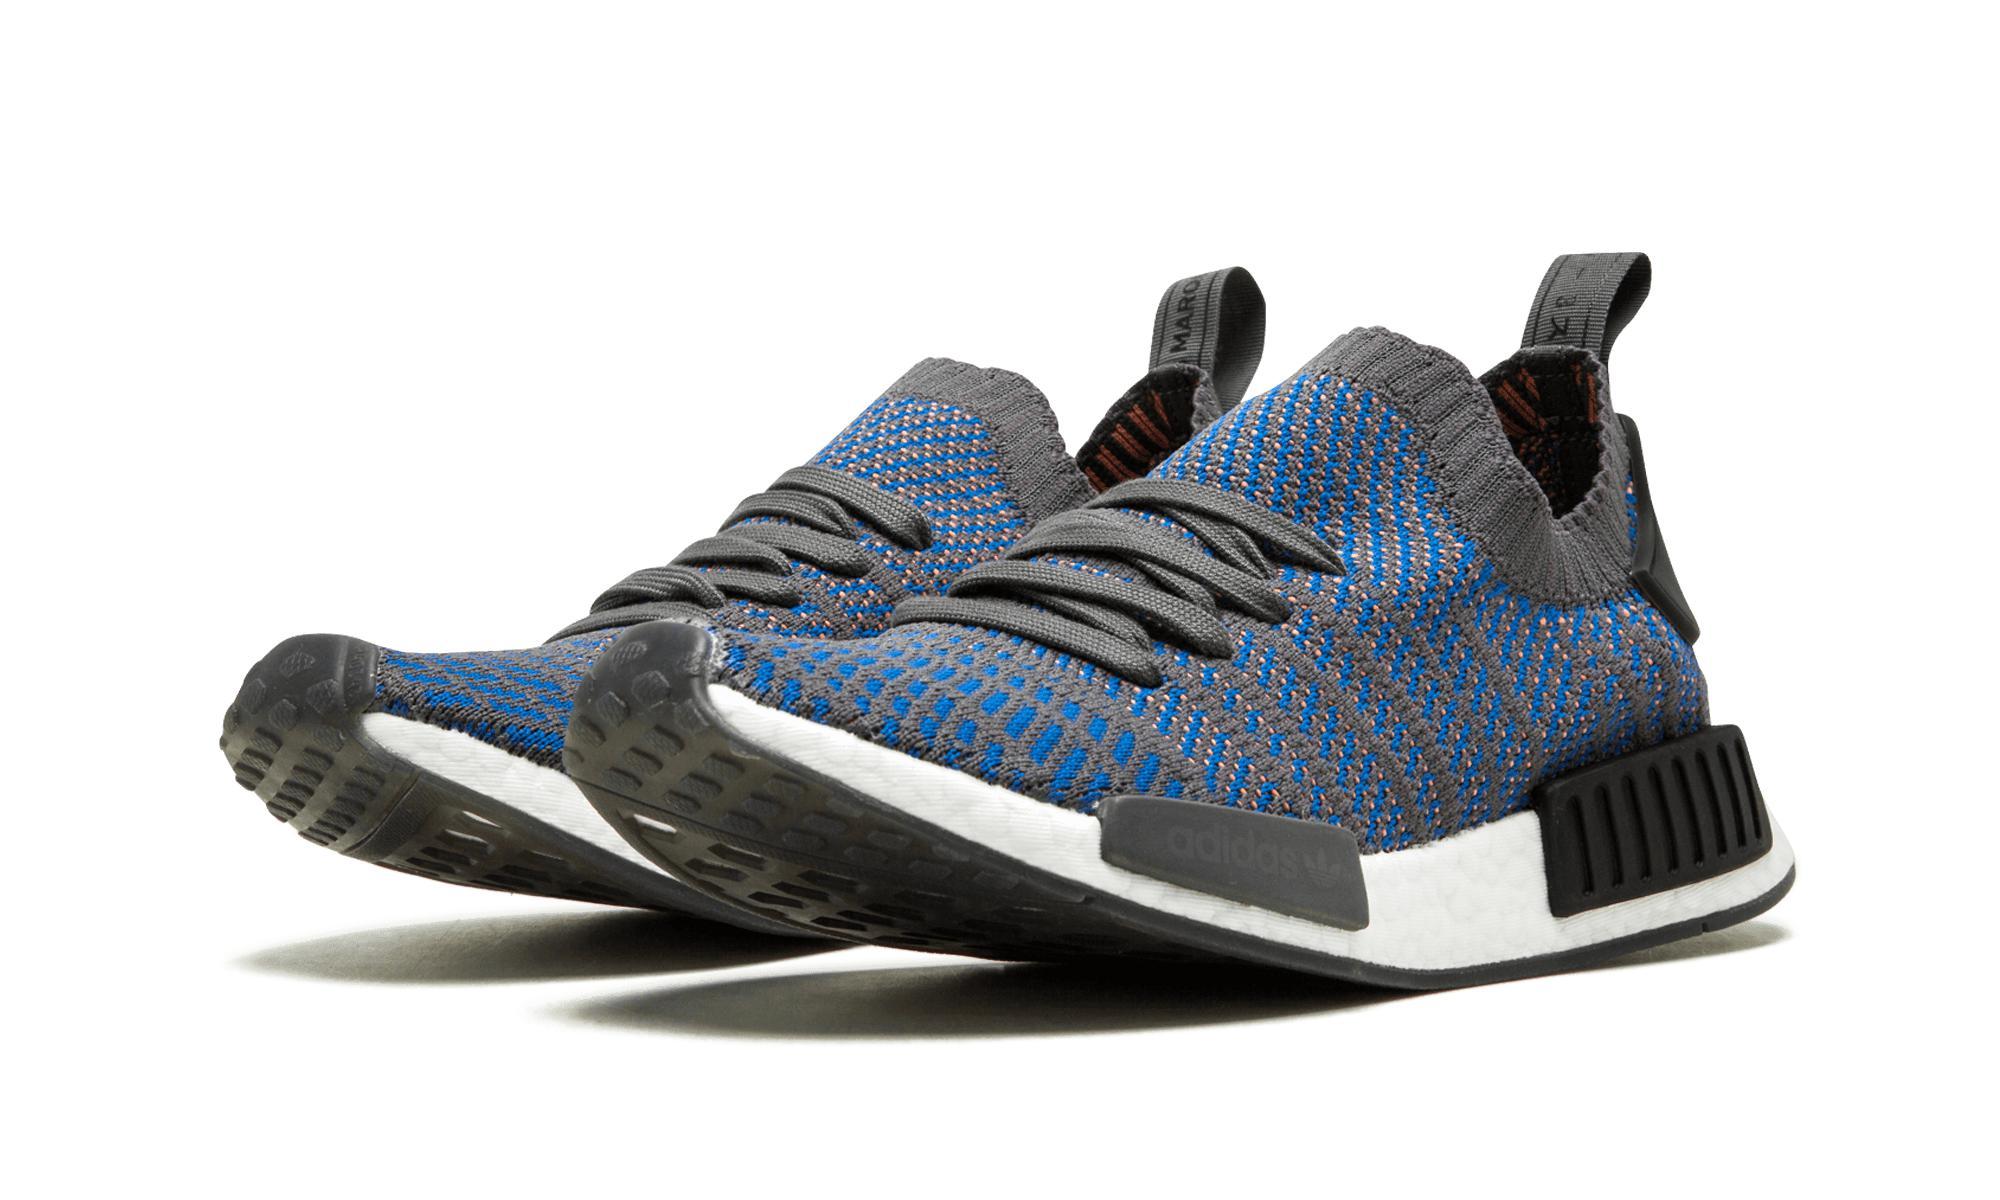 buy popular 3e7b7 392cf adidas Nmd R1 Stlt Pk in Blue for Men - Lyst